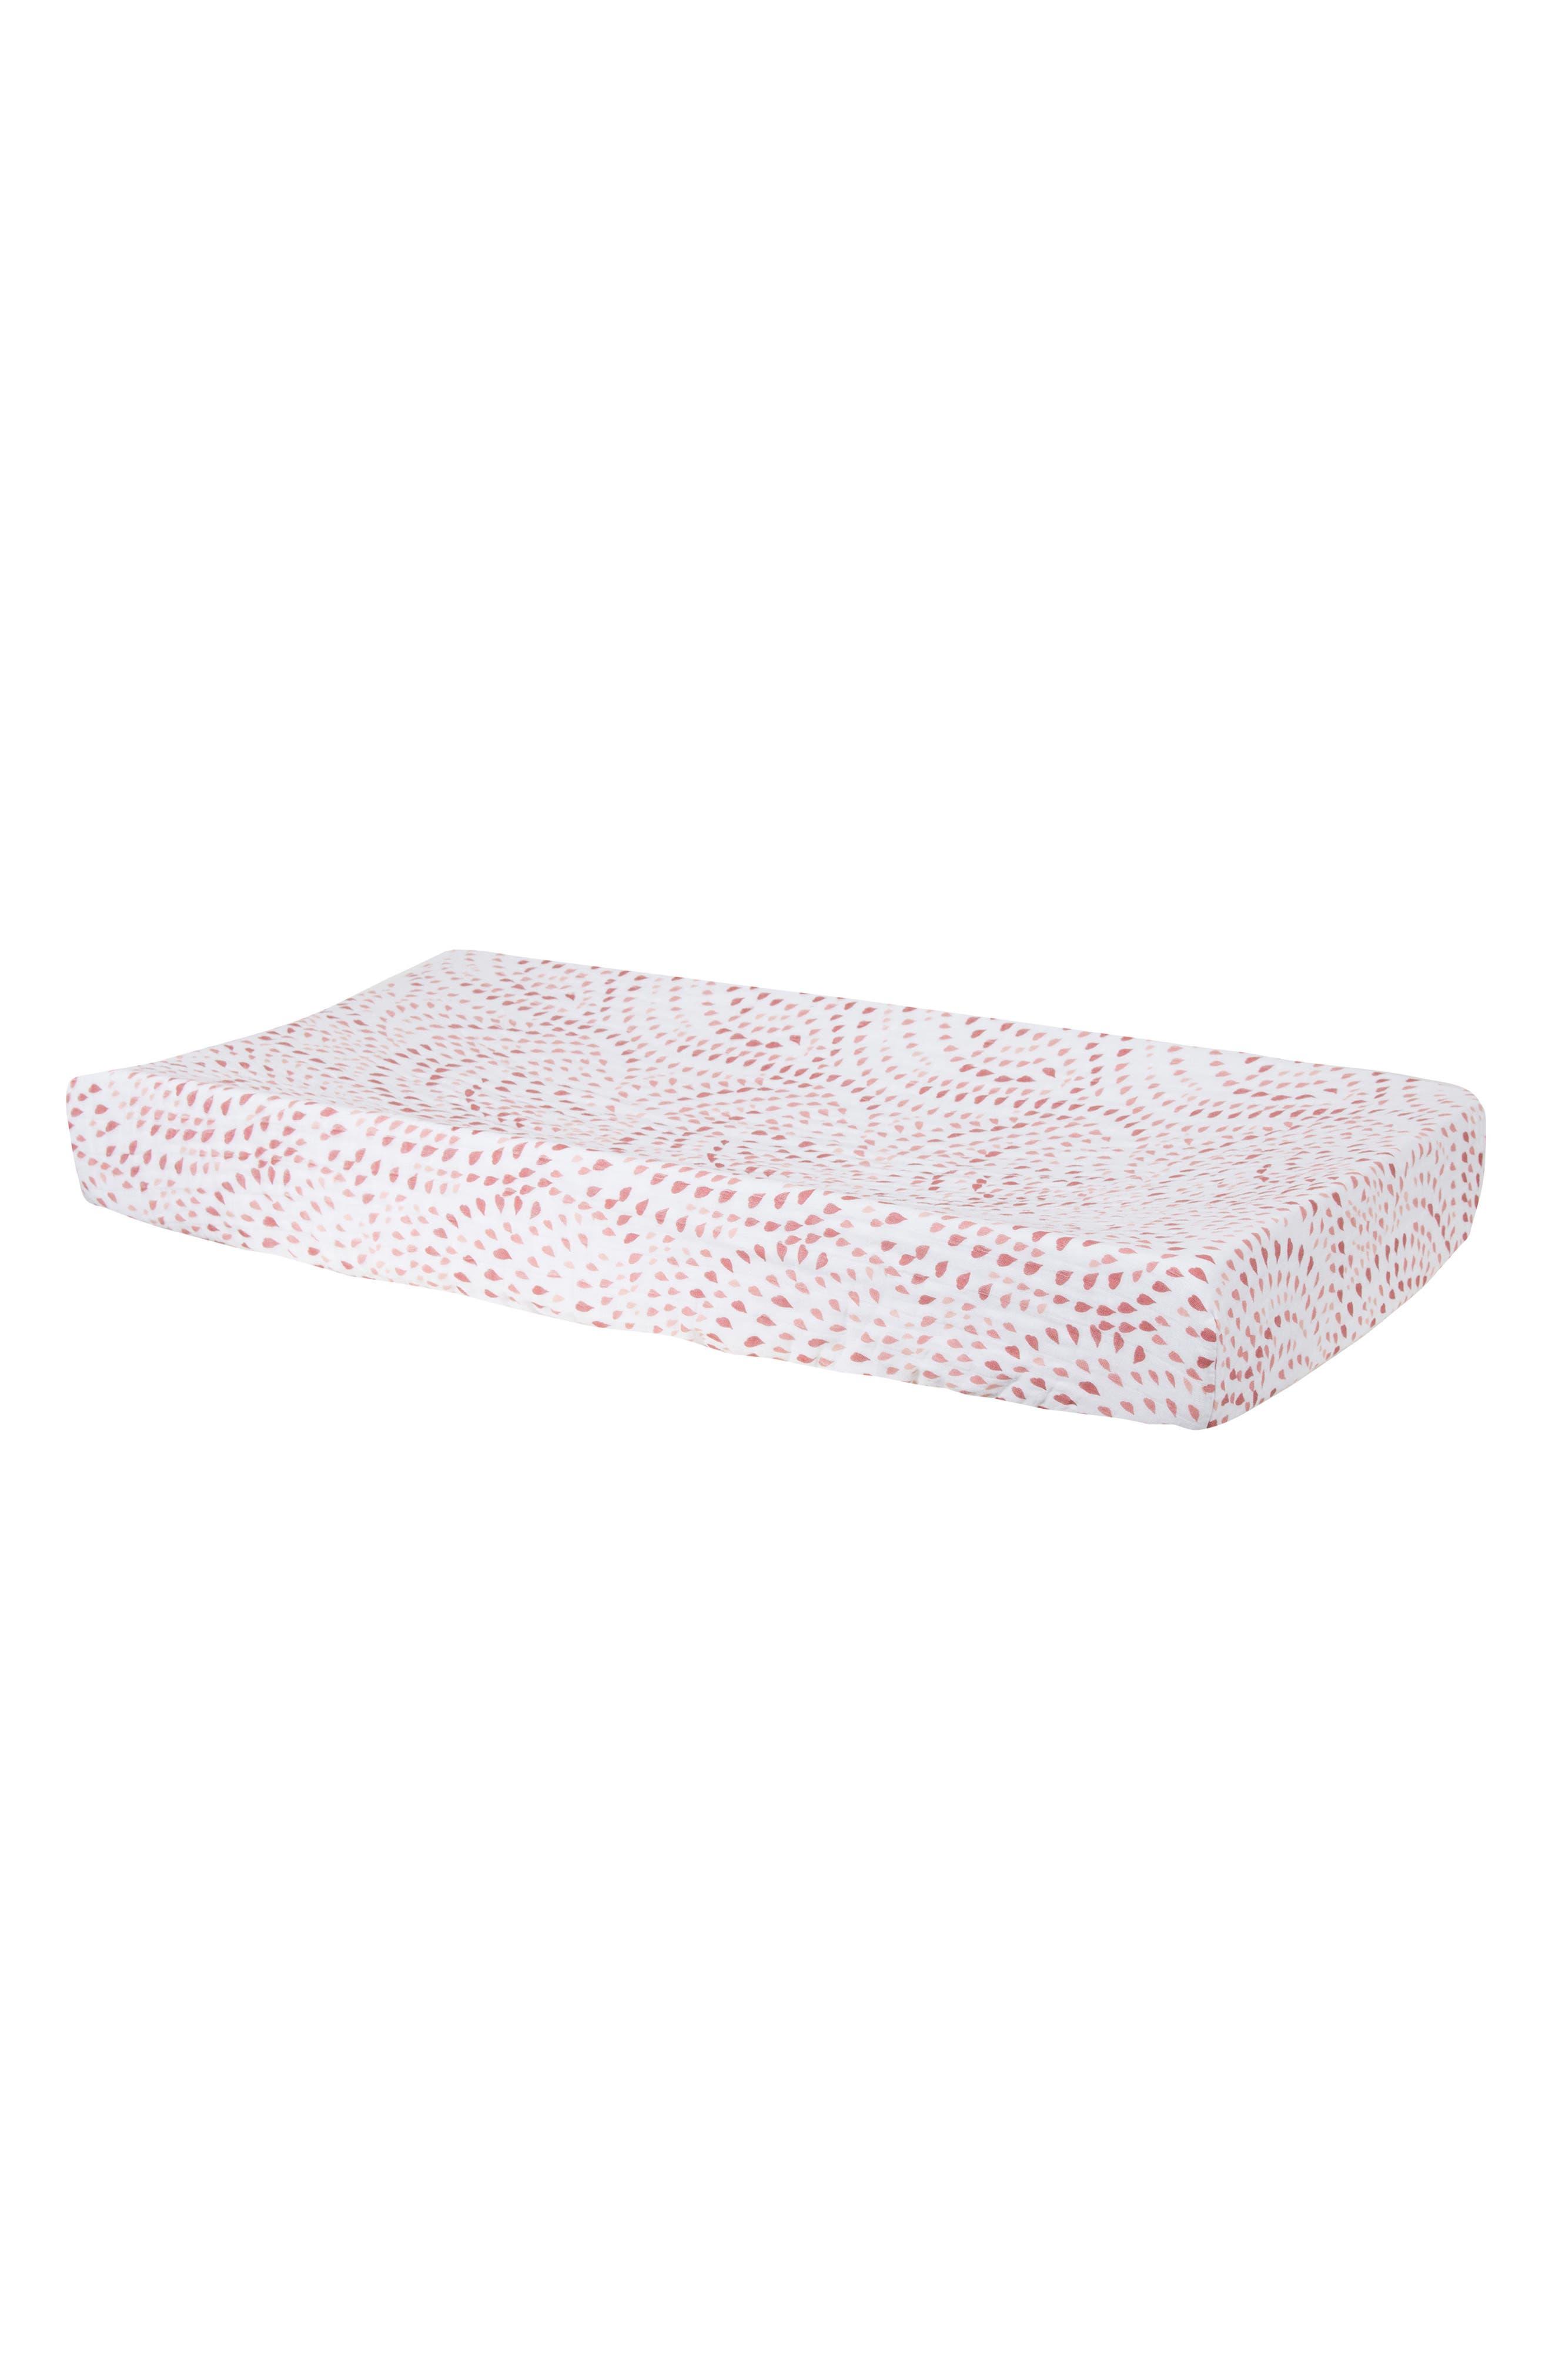 Bébé au Lait Muslin Crib Sheet